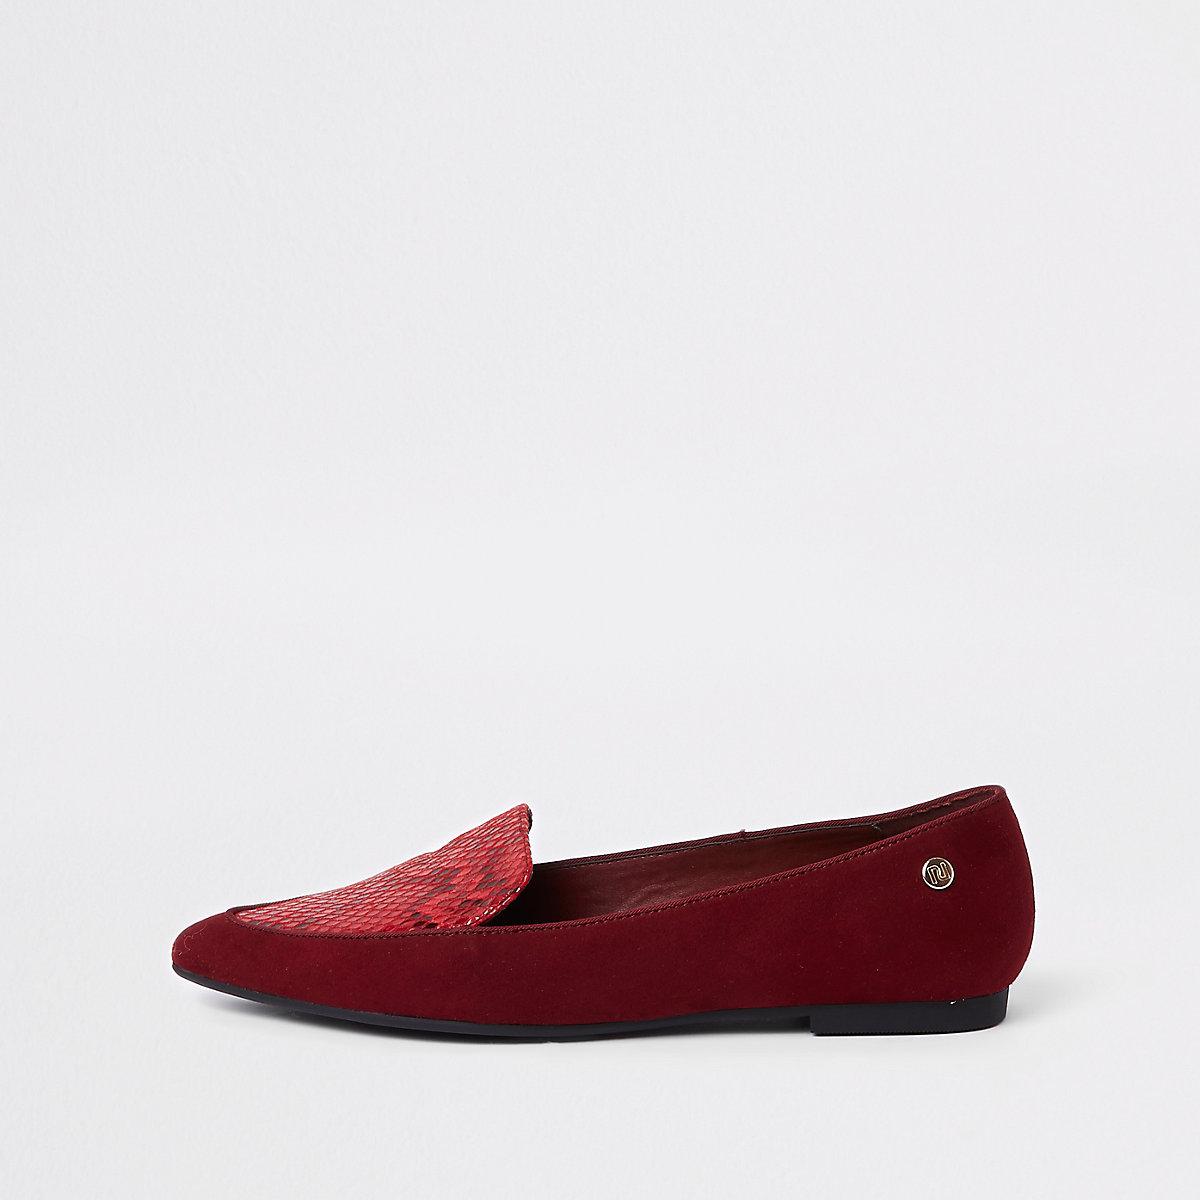 Chaussures Plates Rouges Rouges Plates Rouges Plates Plates Plates Chaussures Rouges Plates Chaussures Chaussures Rouges Chaussures Rouges Chaussures Chaussures BqOAq